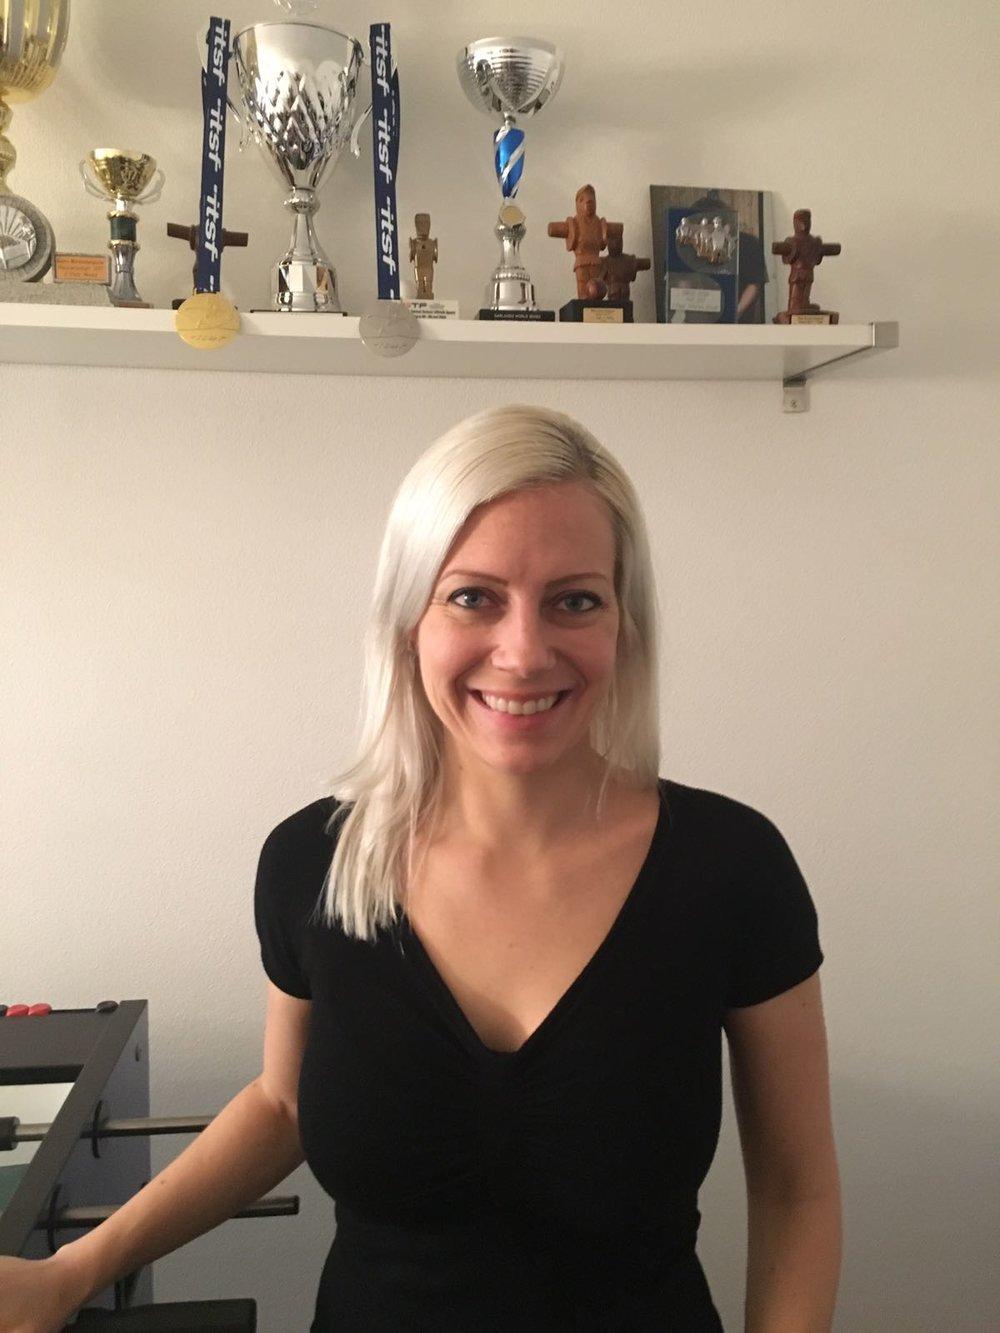 Dina Mettler, ZG